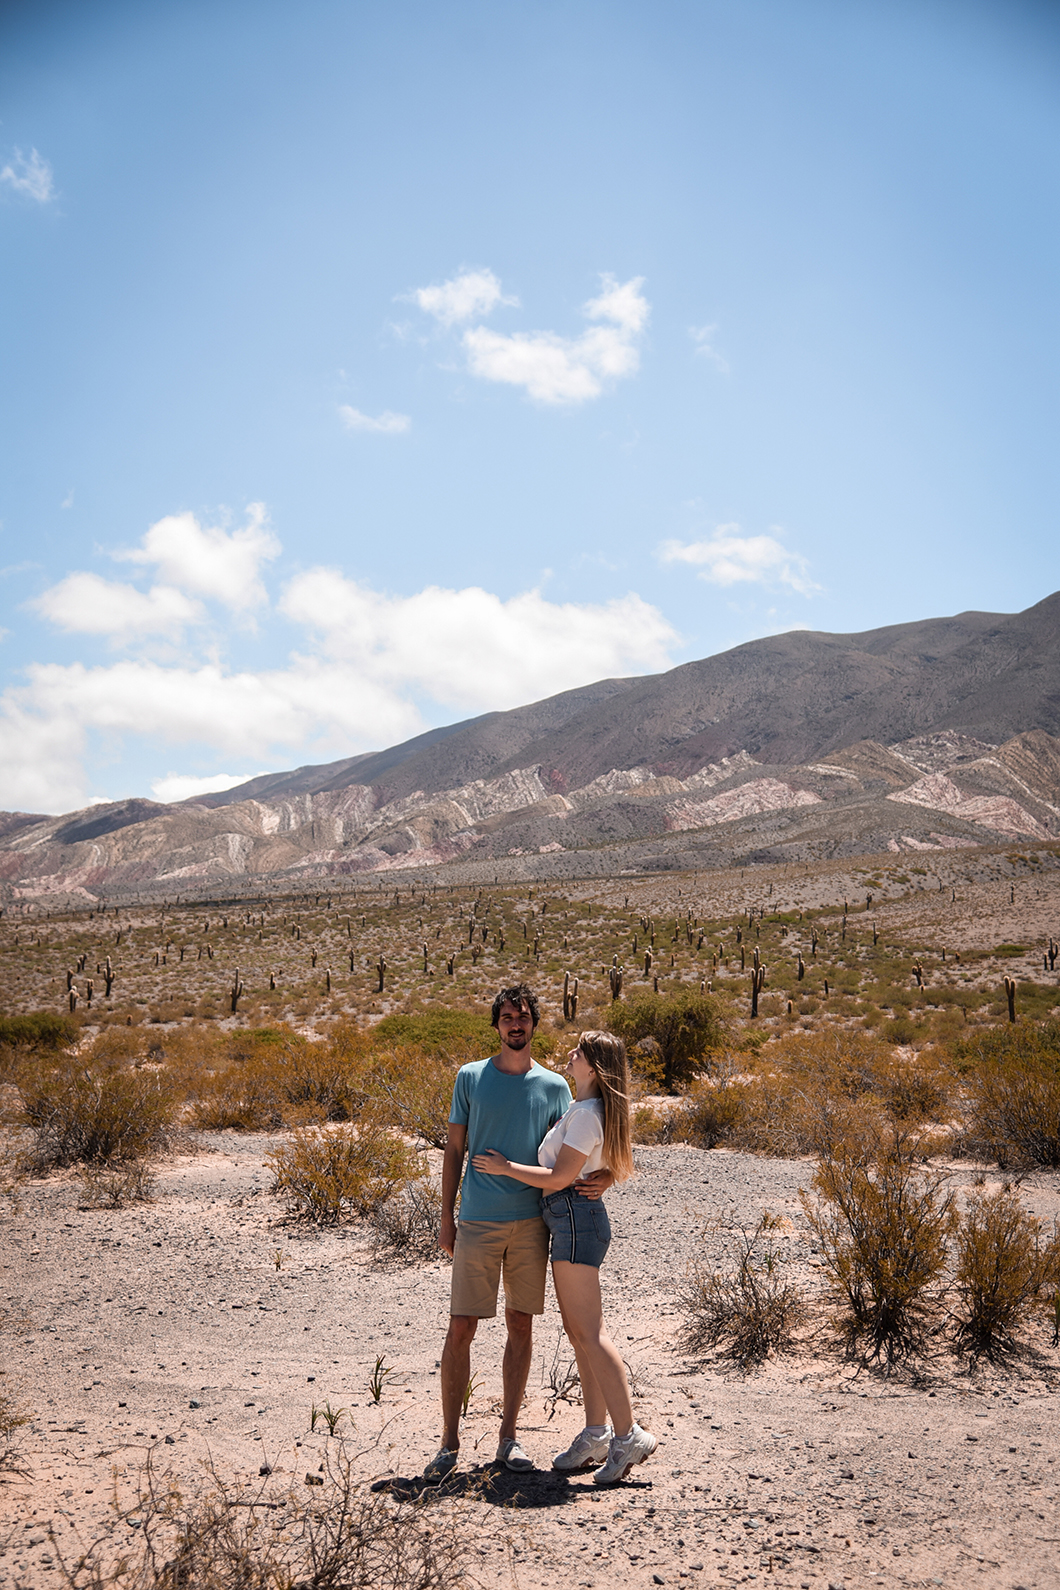 Roadtrip au Parque national Los Cardones